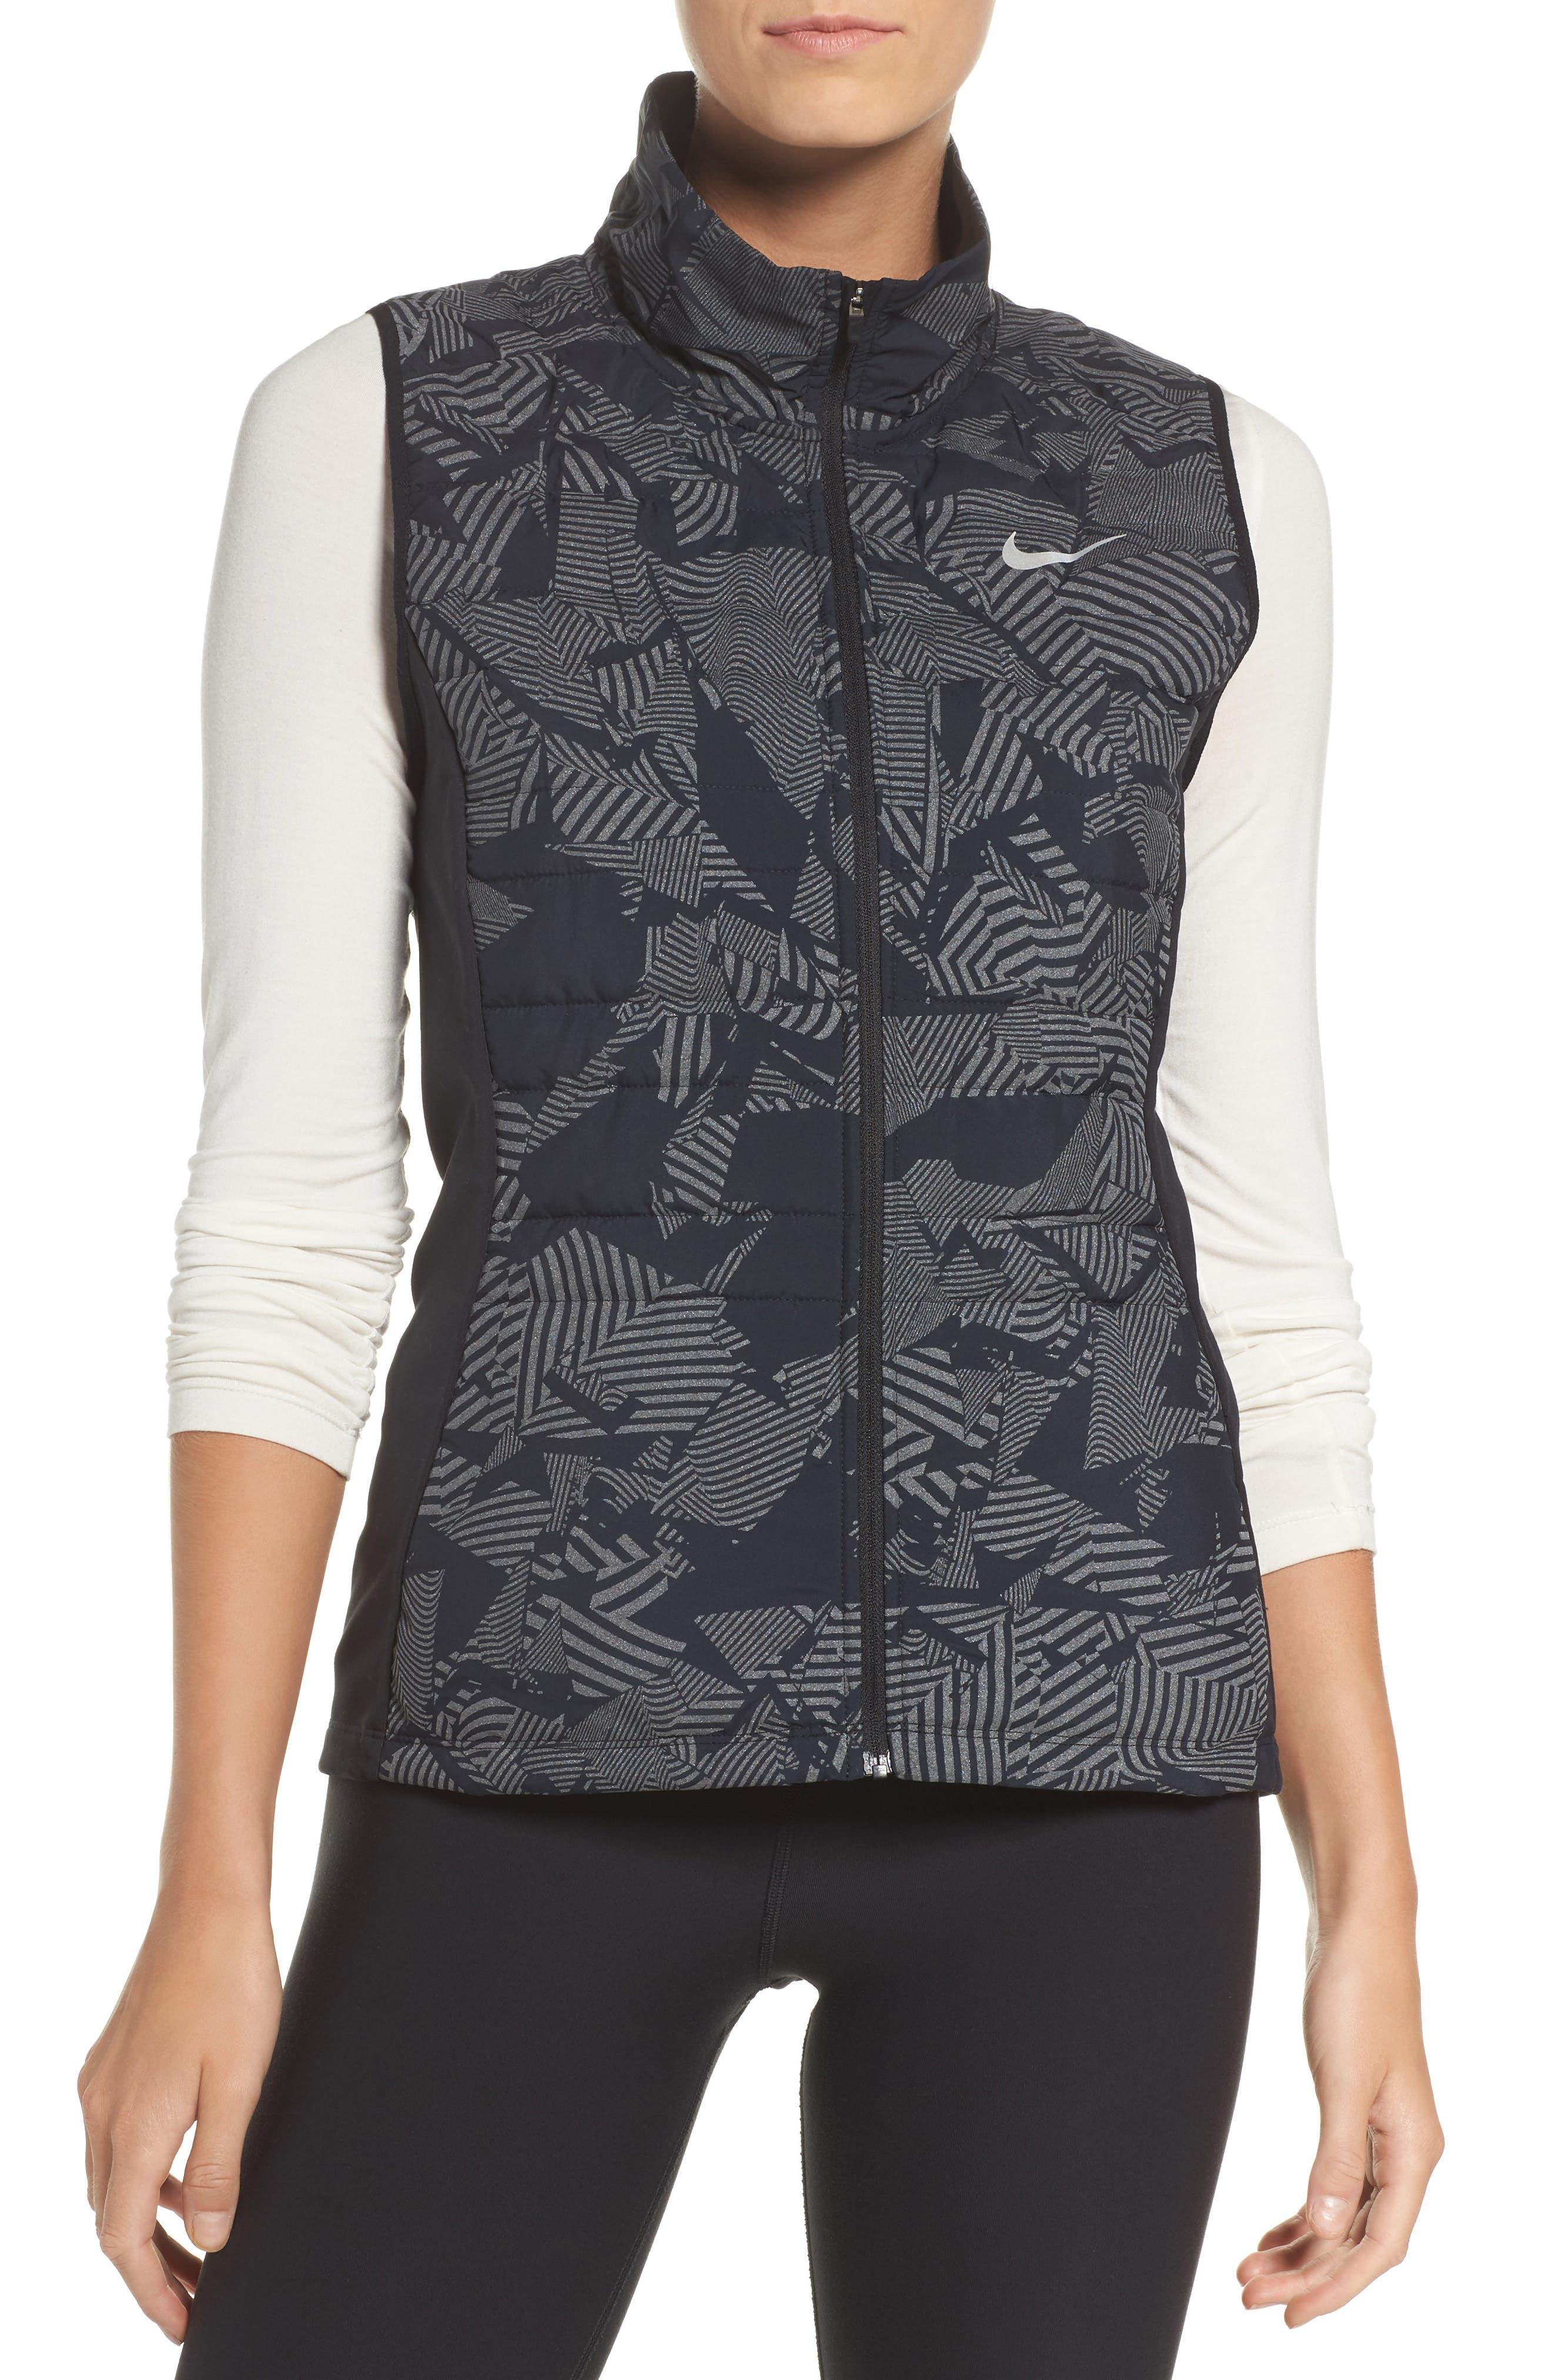 Essential Flash Running Vest,                         Main,                         color, Black/ Black/ Metallic Silver